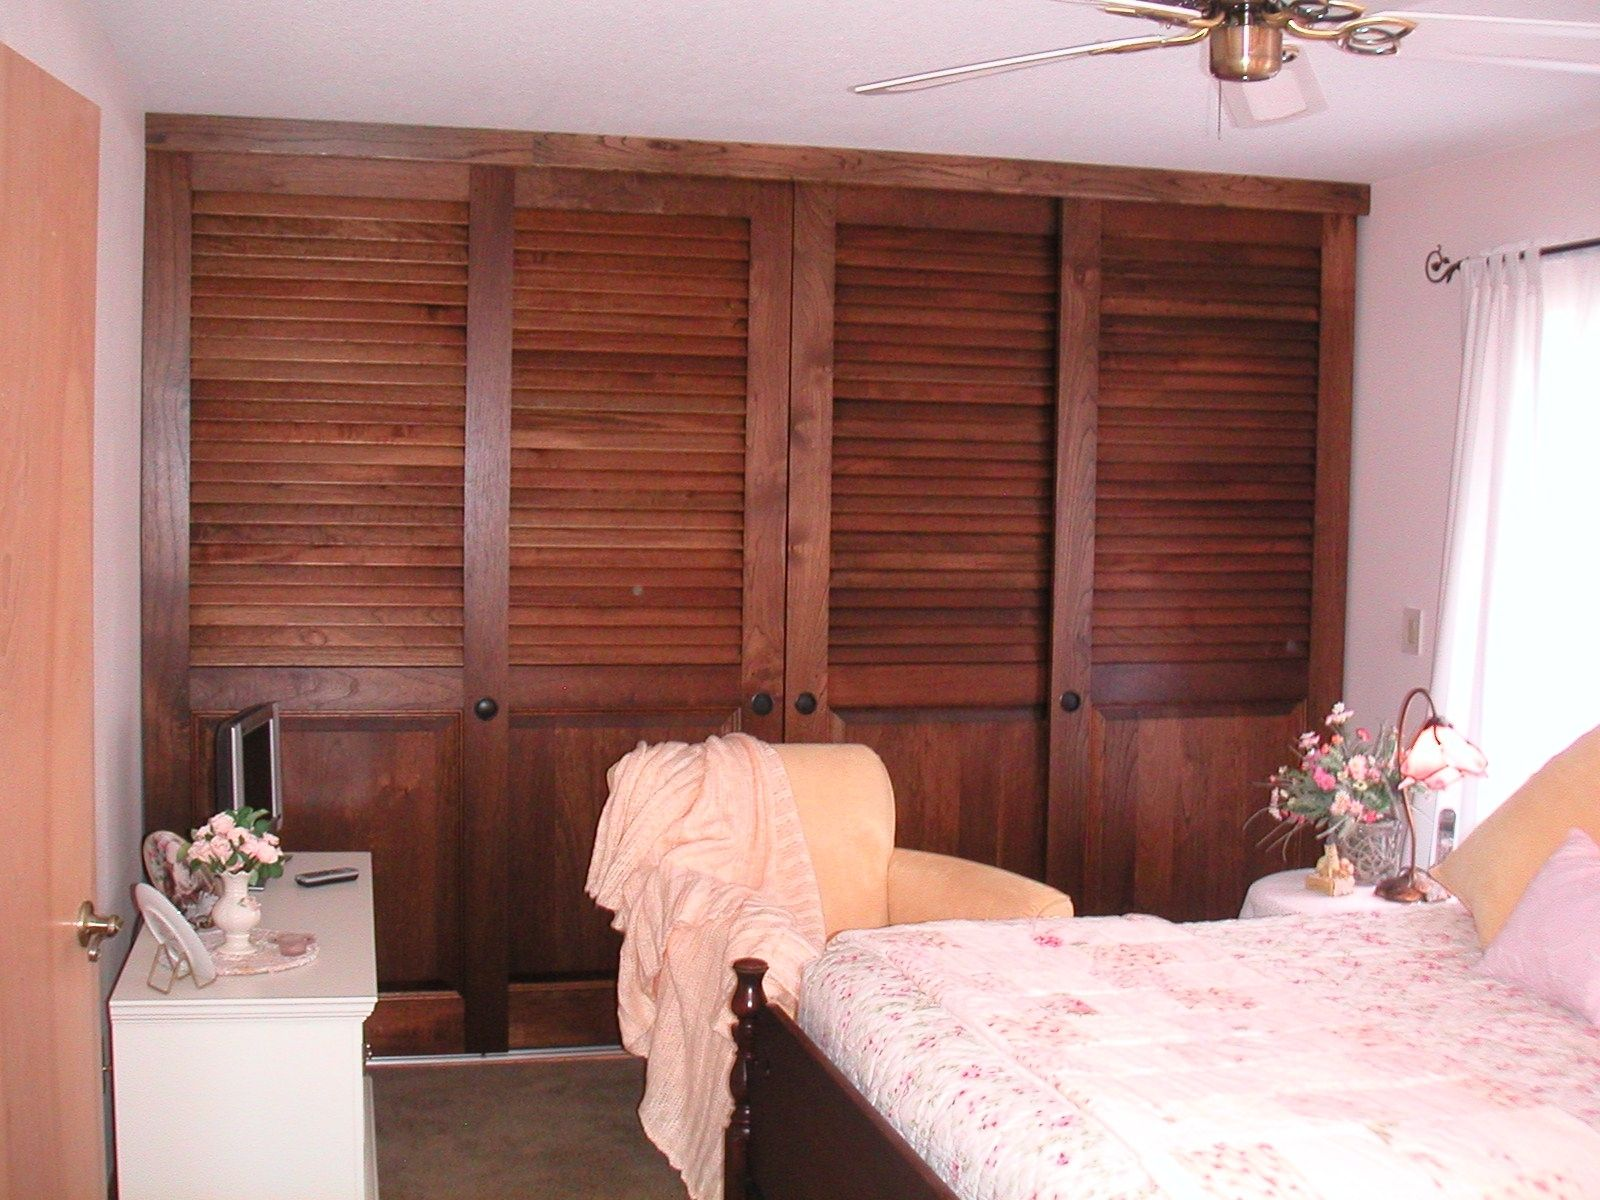 Custom Sized Sliding Closet Doors 2 1 Fixed Plantation Louvers Over Colonial Raised Panels